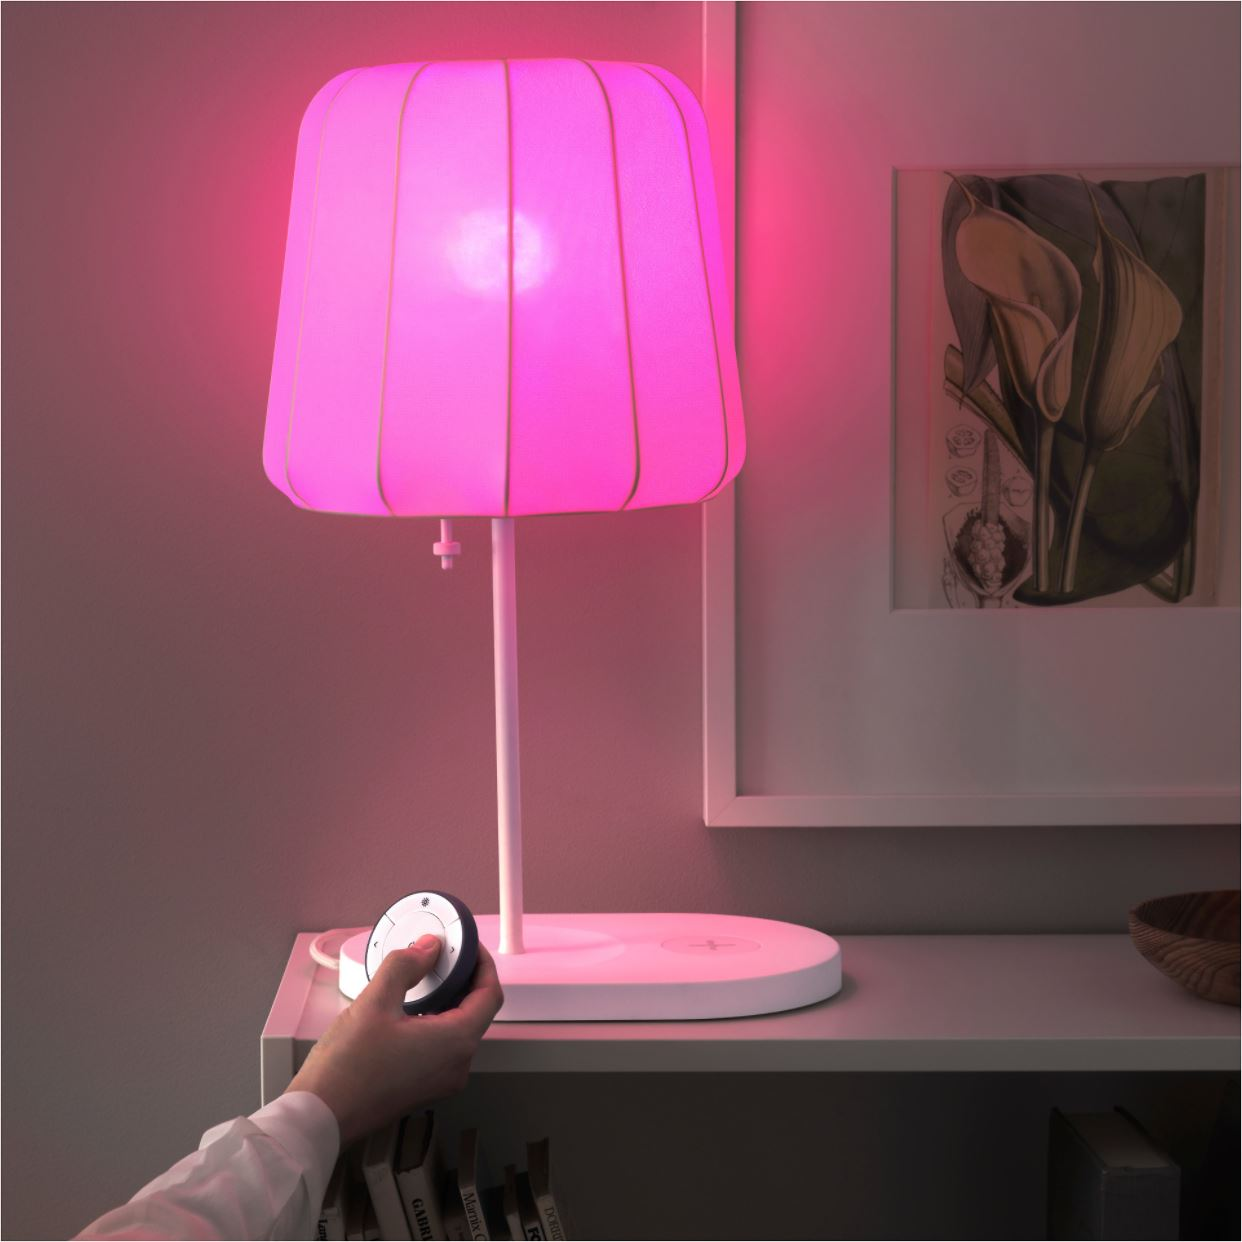 TRADFRI: IKEAs smartes Beleuchtungssystem lässt sich jetzt auch per Google Assistant steuern